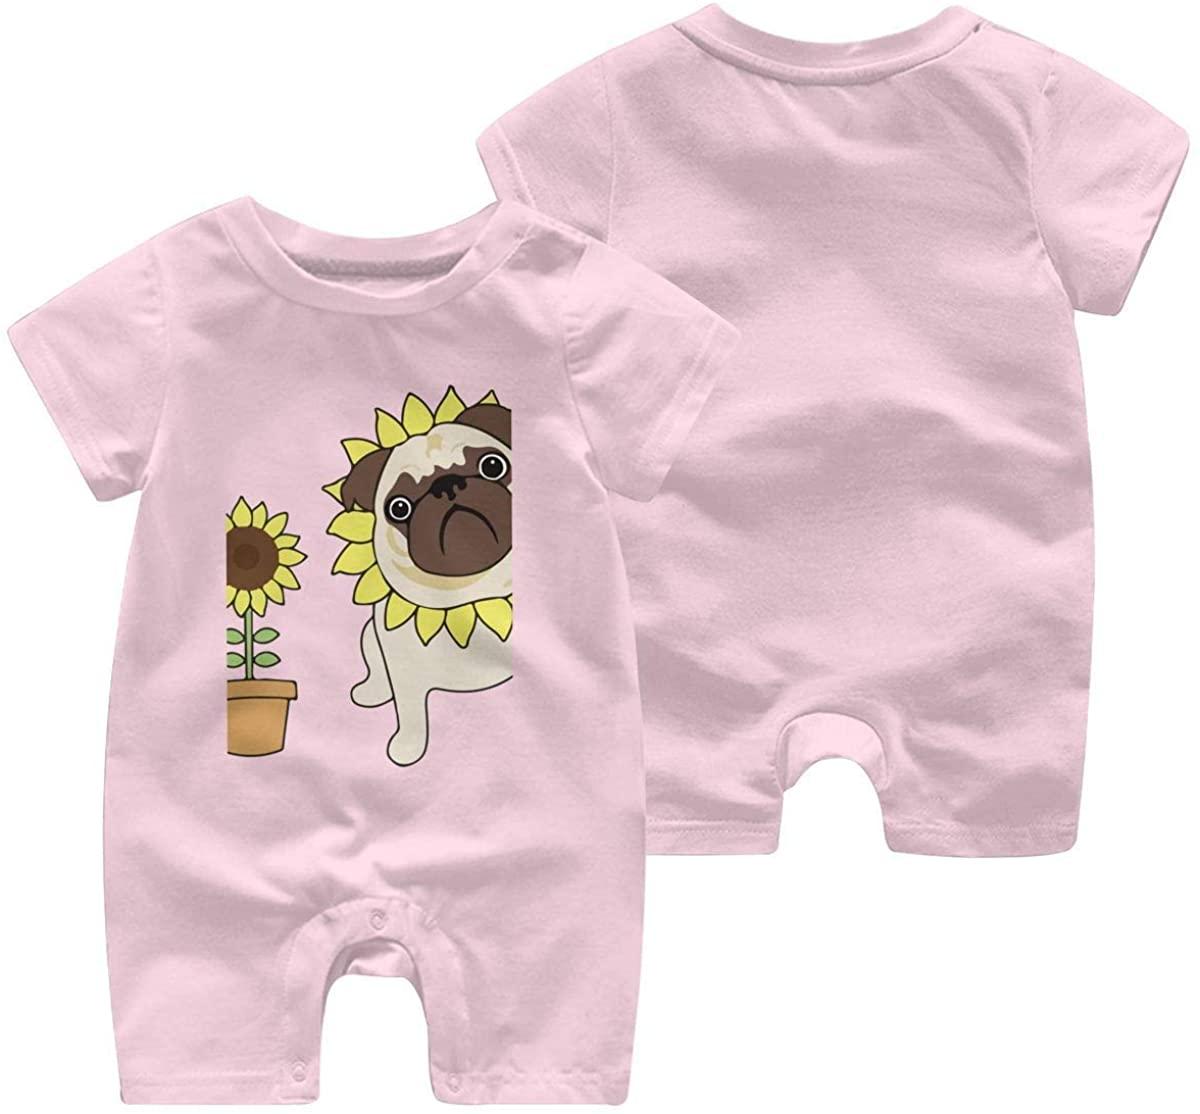 ChenYeSheng Baby Girls Boys Sunflower Pug Short Sleeve Bodysuit Romper Jumpsuit Pink6M